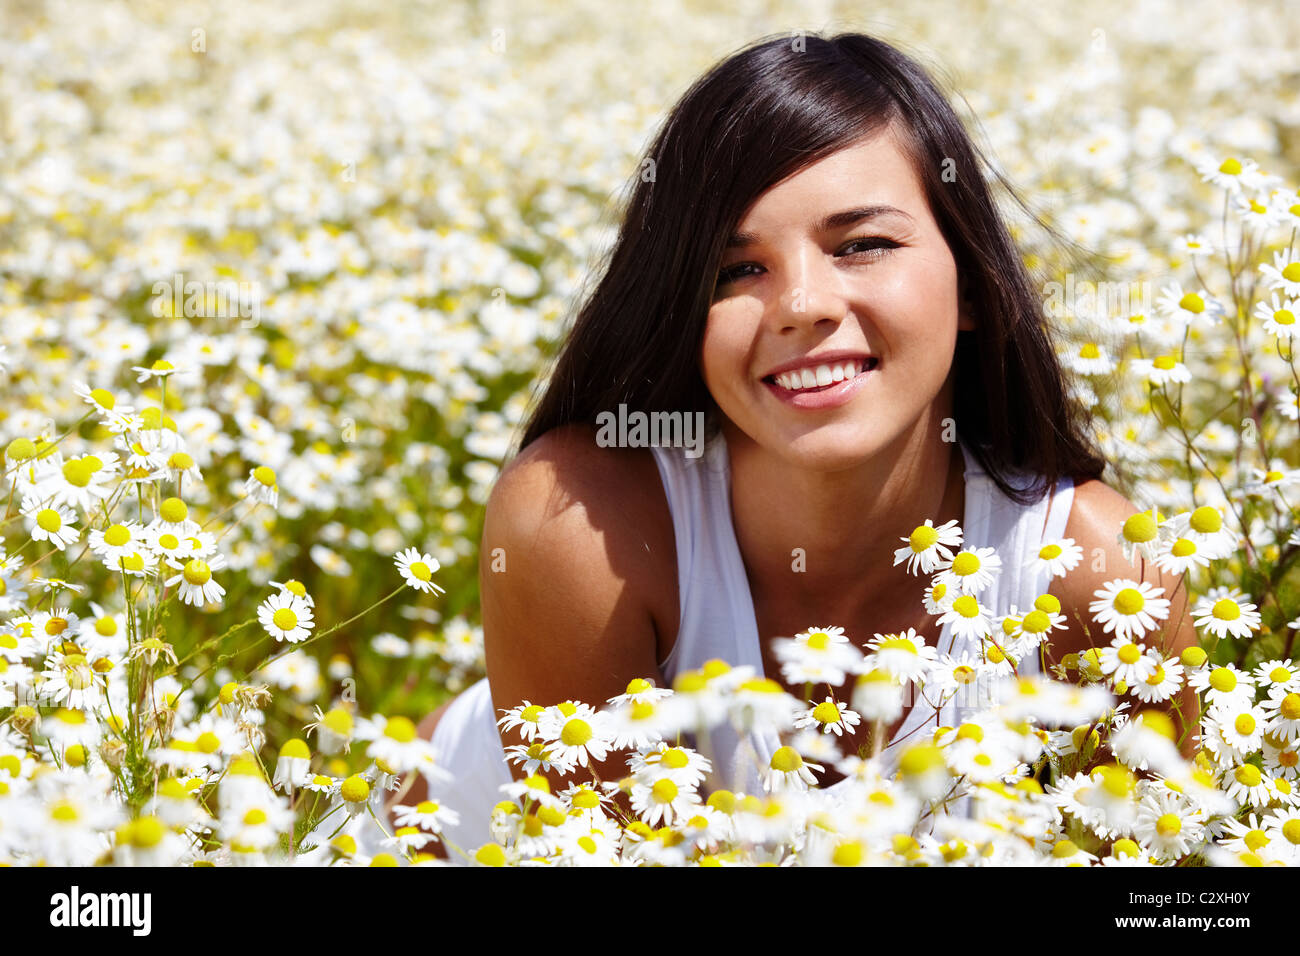 Image of happy female peeking out of chamomile glade and smiling - Stock Image